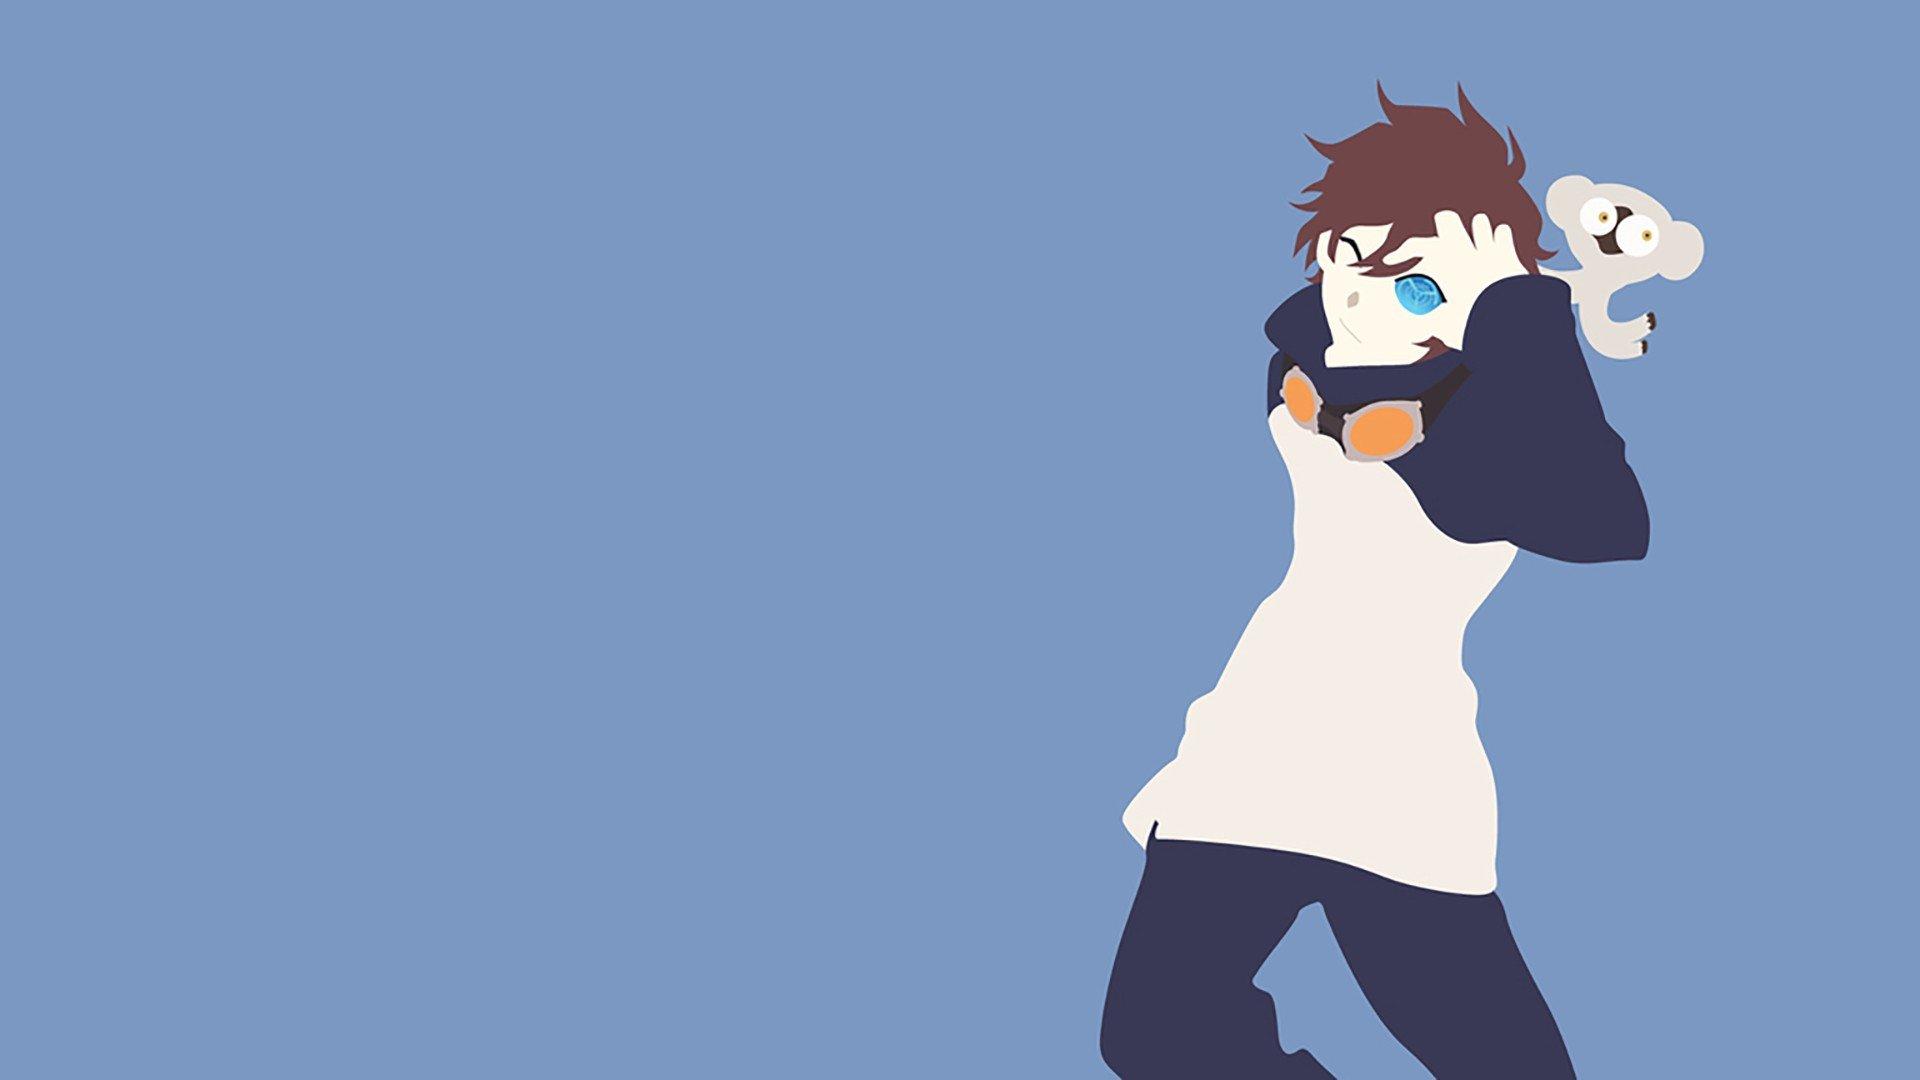 Your Lie In April Quotes Wallpaper Kekkai Sensen Leonardo Watch Sonic Speed Monkey Hd